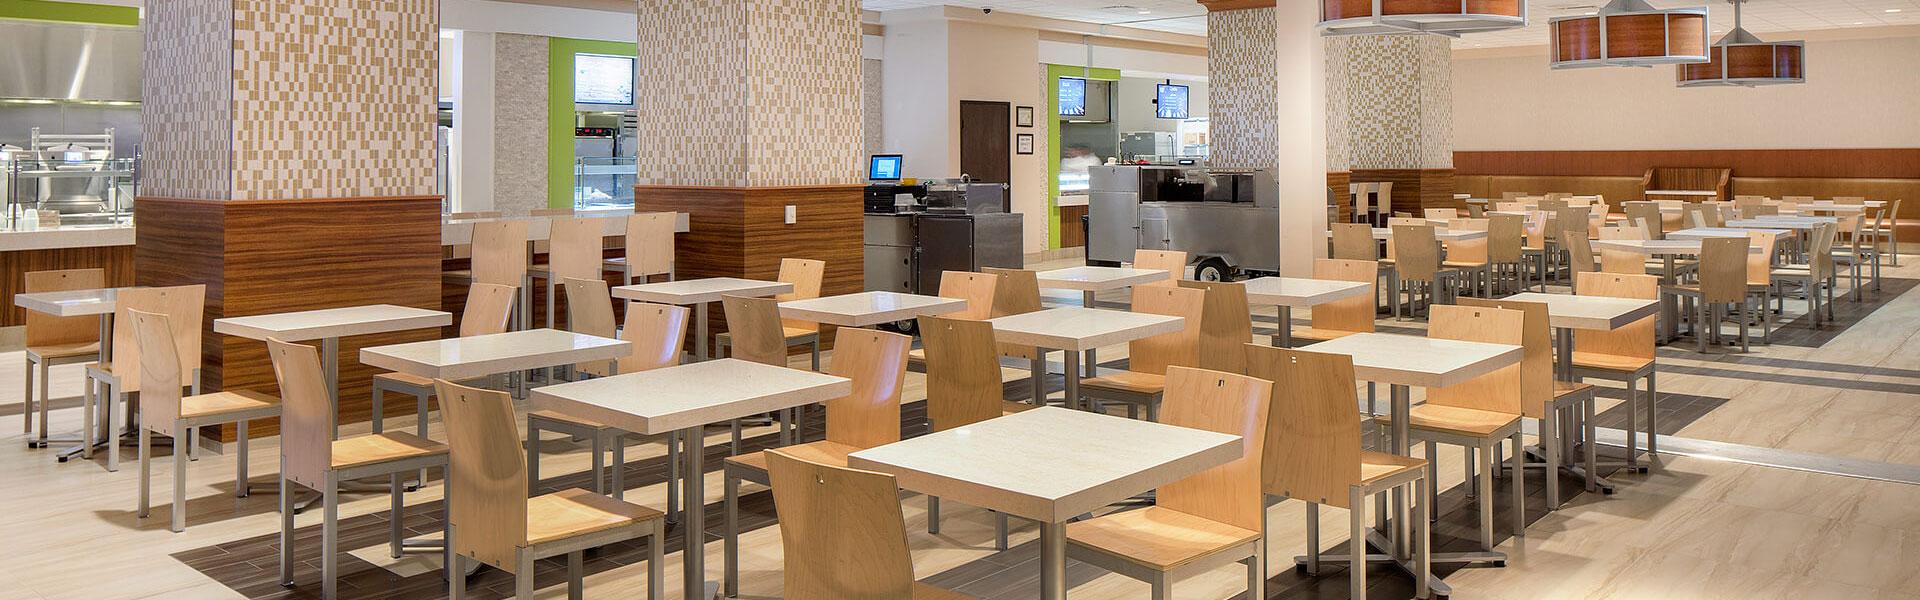 The Food Court at Chumash Casino Resort